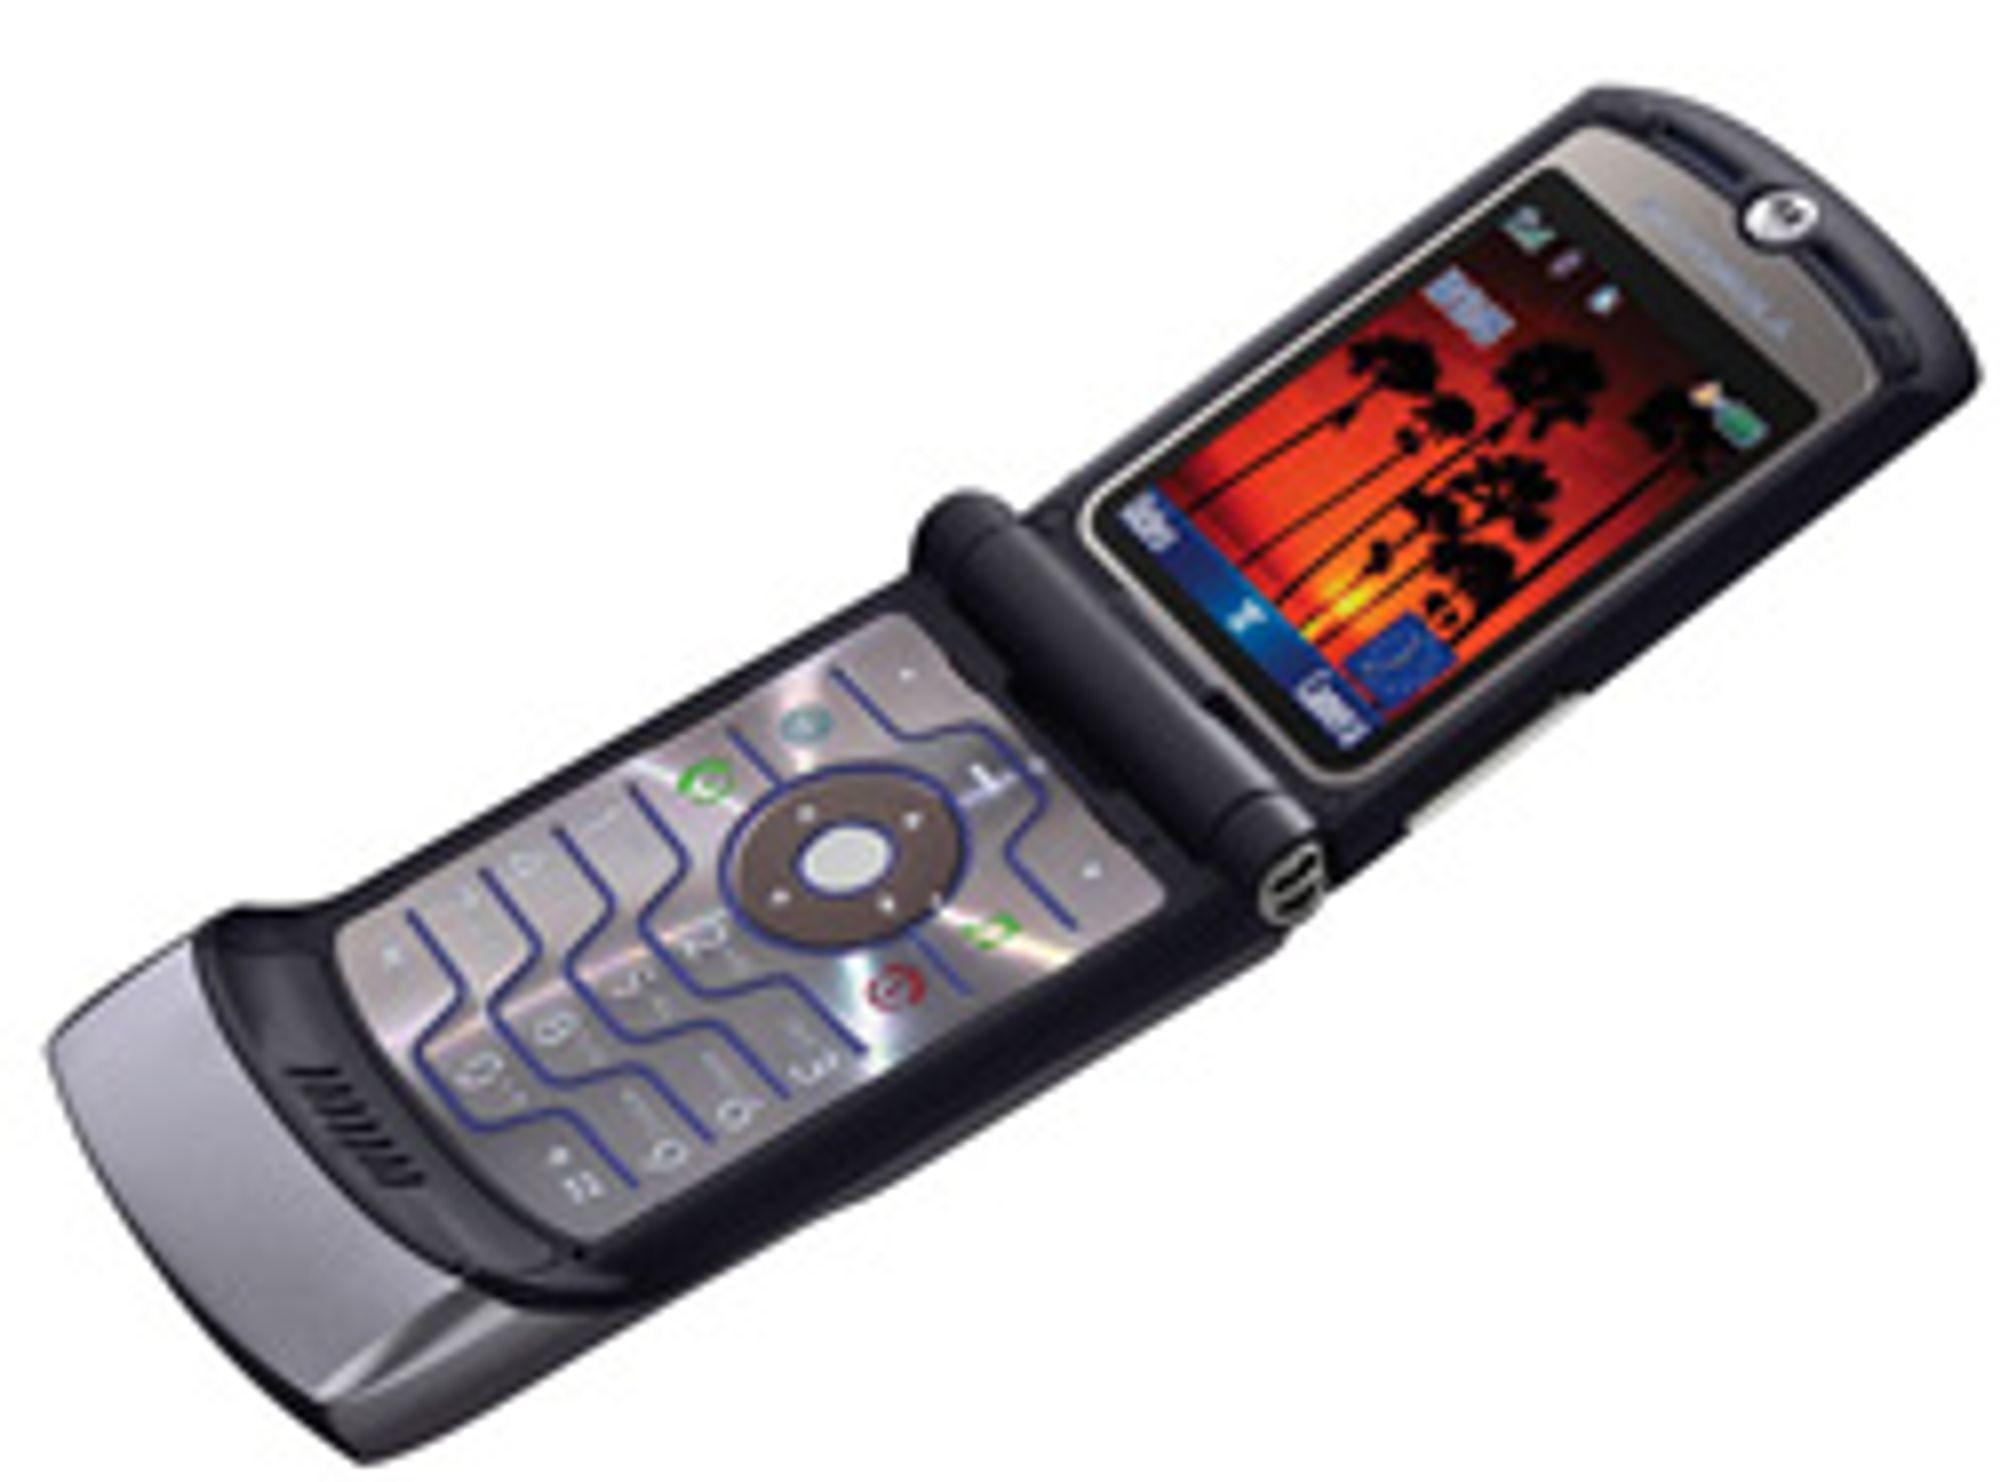 Motorola er klar for nye idéer fra designavdelingen. (Foto: Motorola)